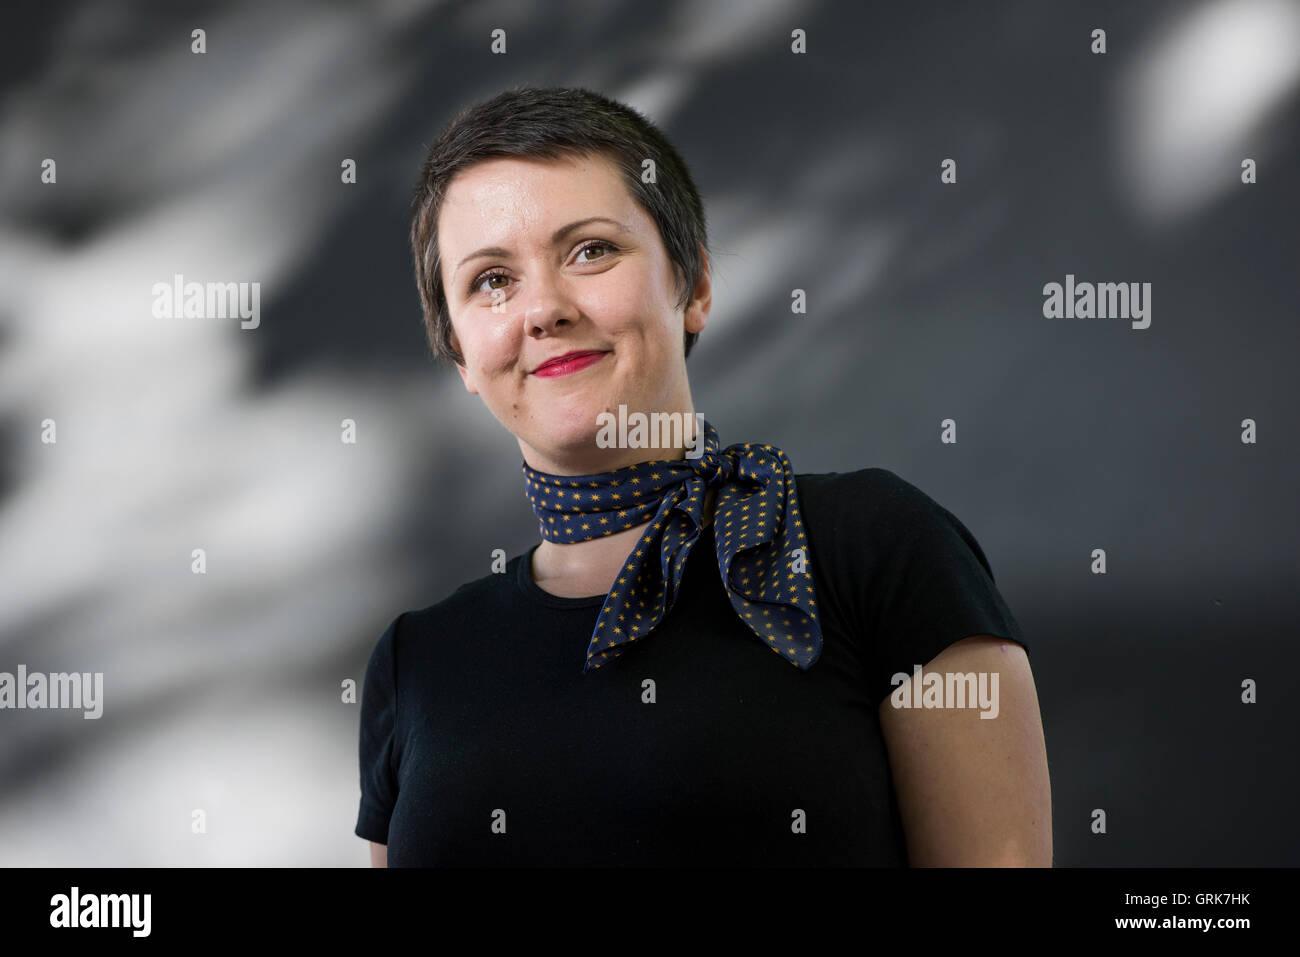 American writer Megan Bradbury. - Stock Image